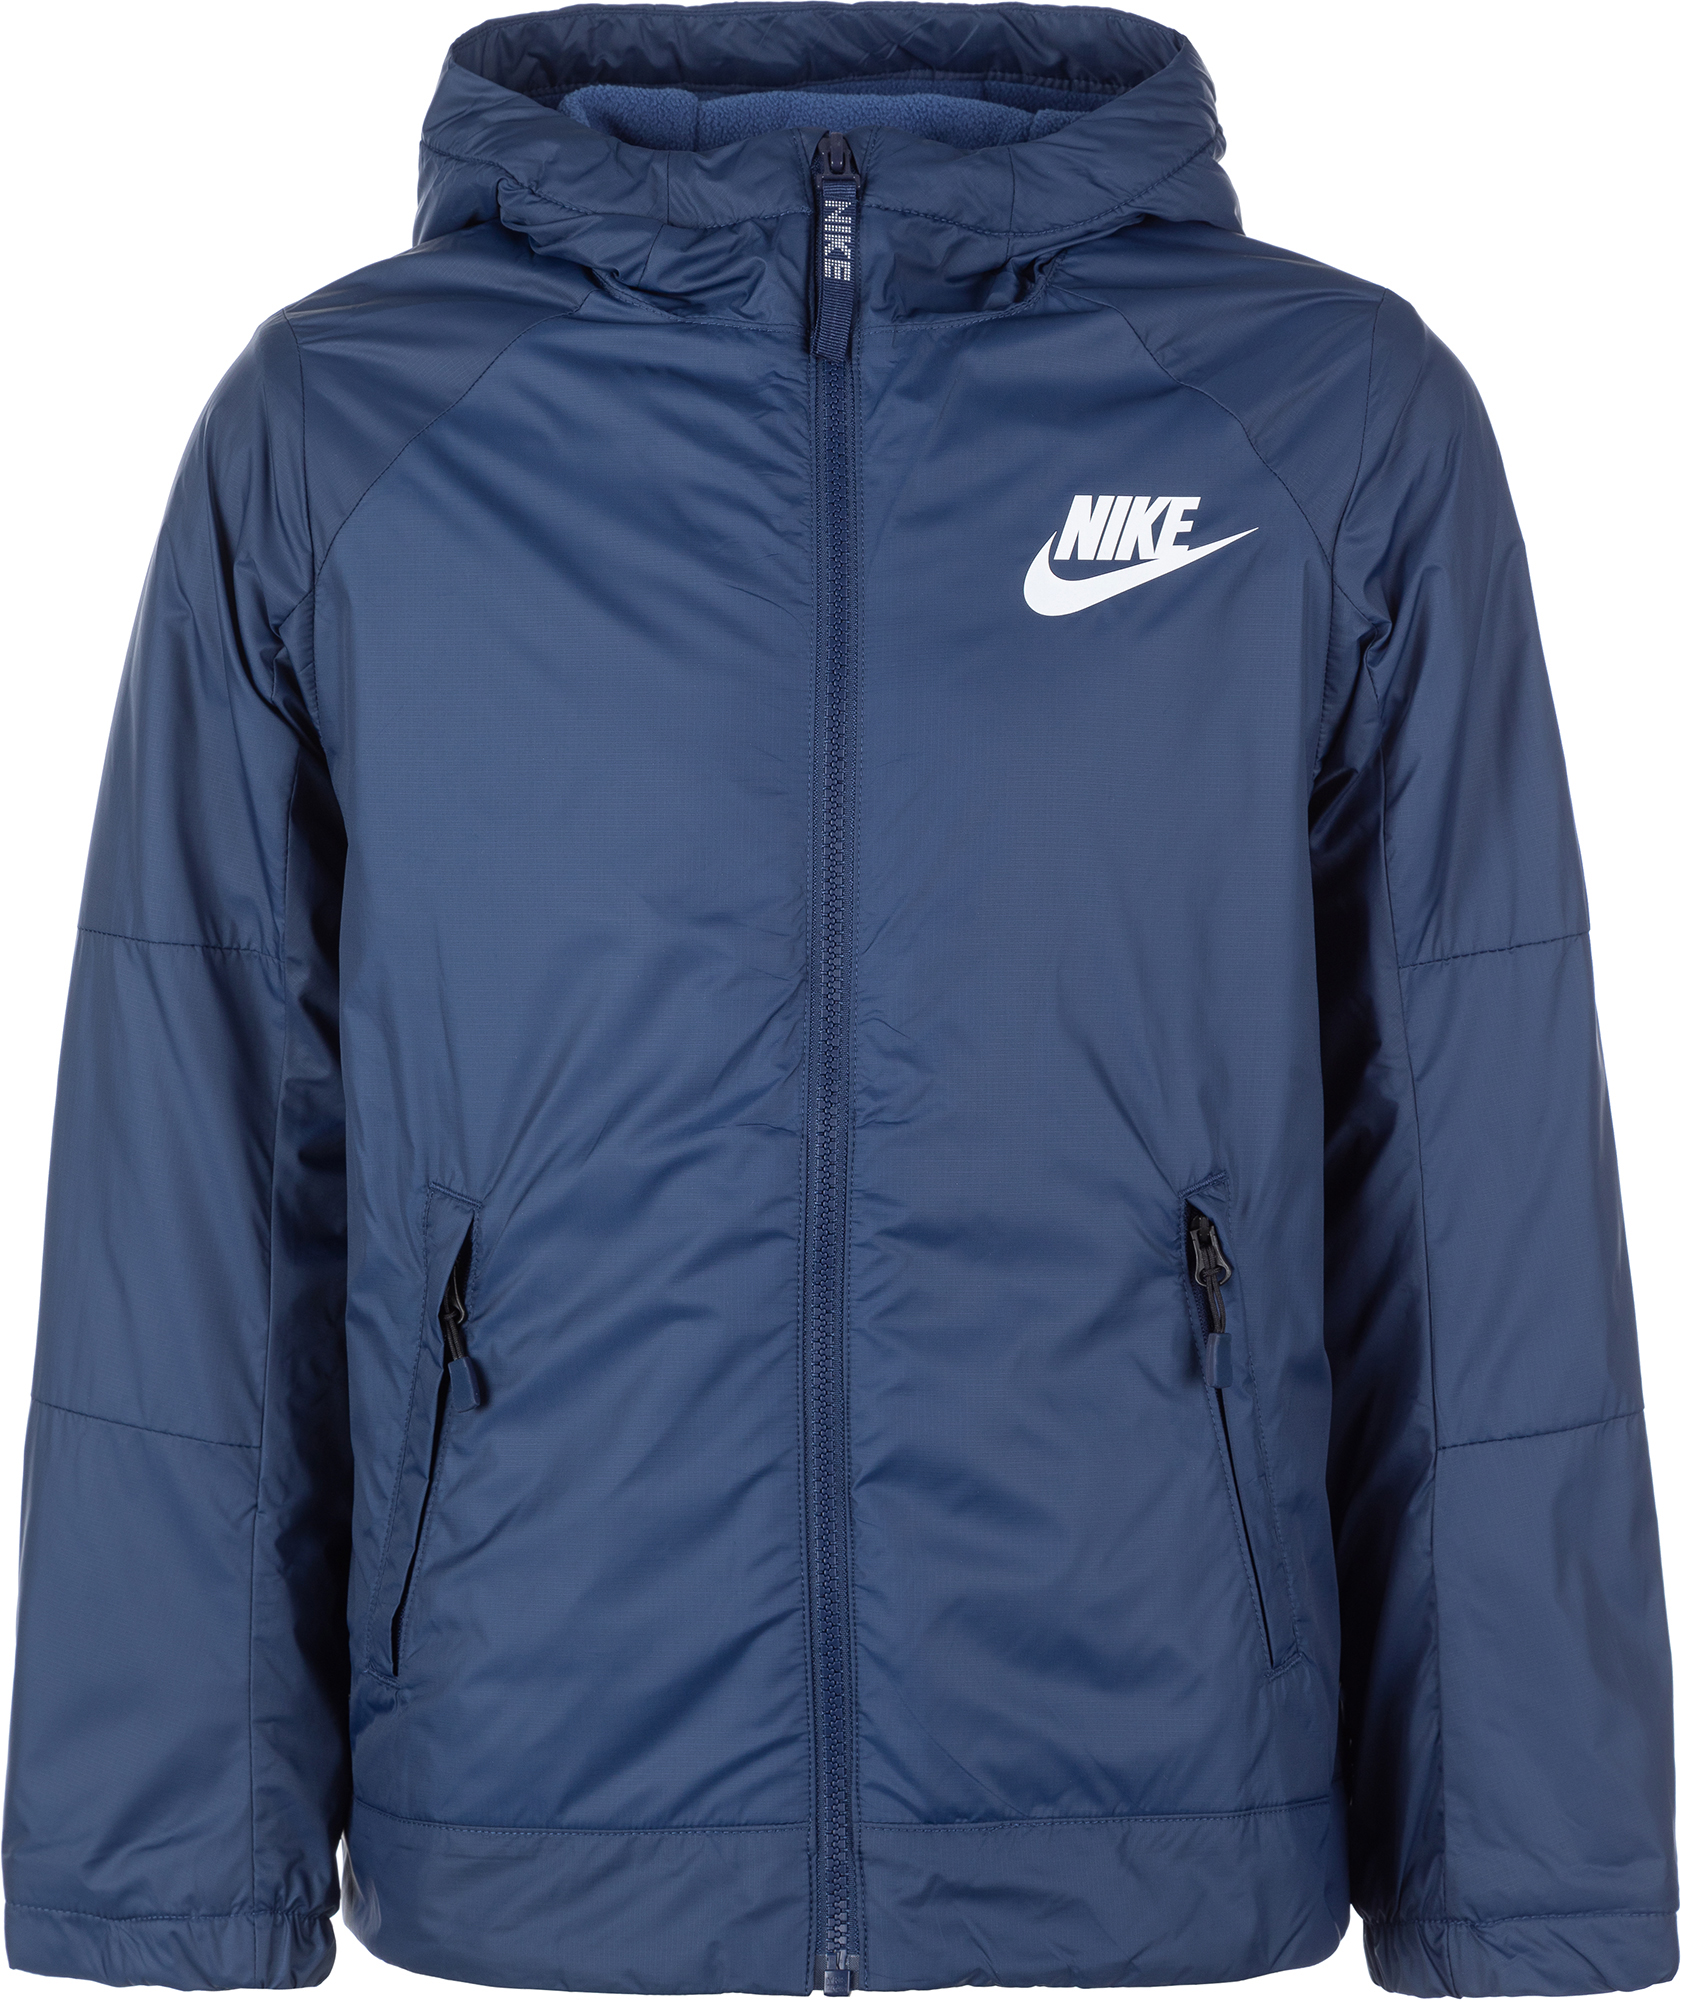 Nike Куртка утепленная для мальчиков Nike, размер 147-158 цена и фото